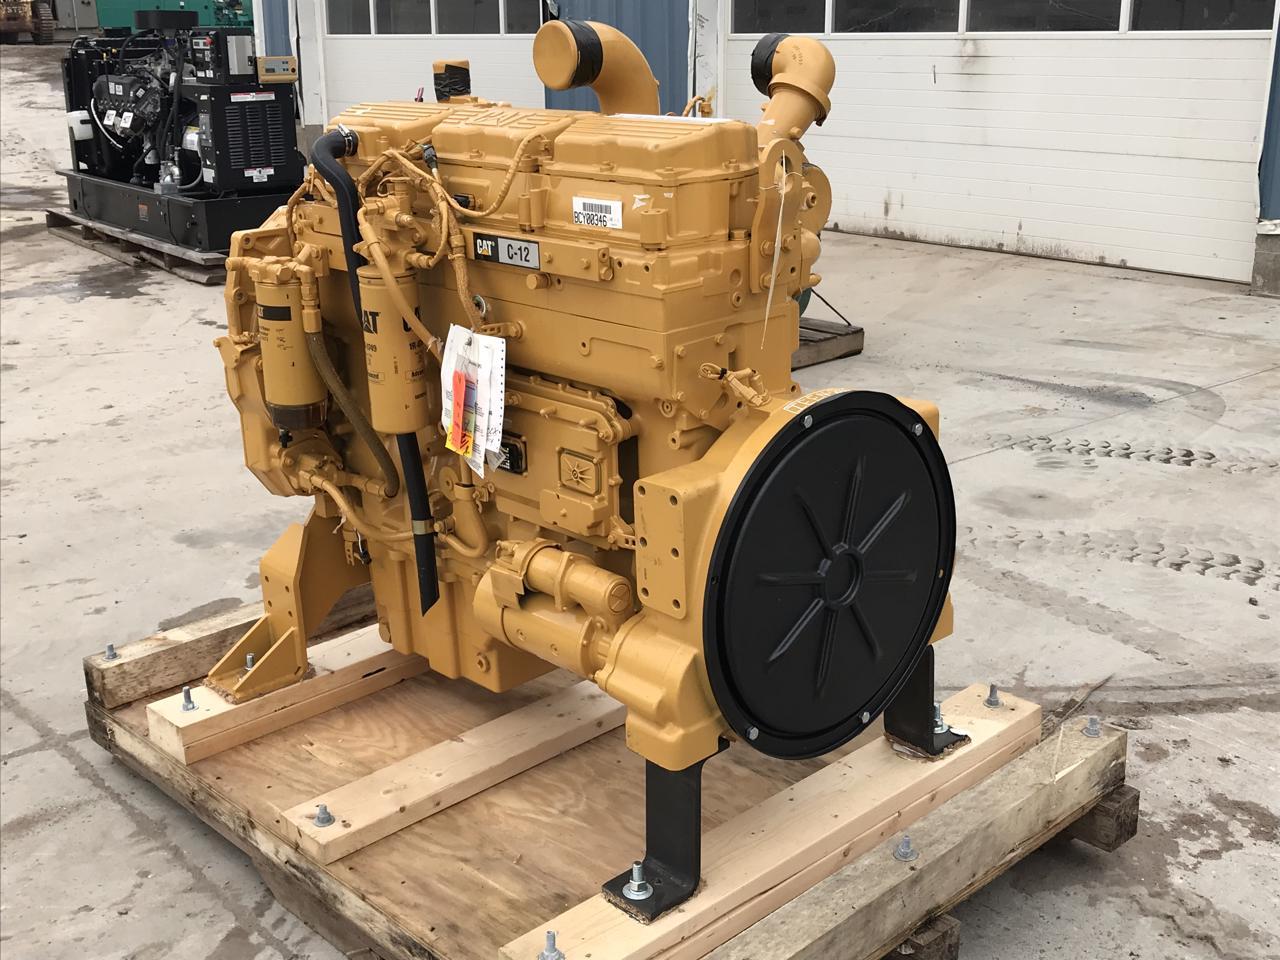 C12 CAT Engine, Unused Engine, 515 HP, 2008, SAE 1, 14